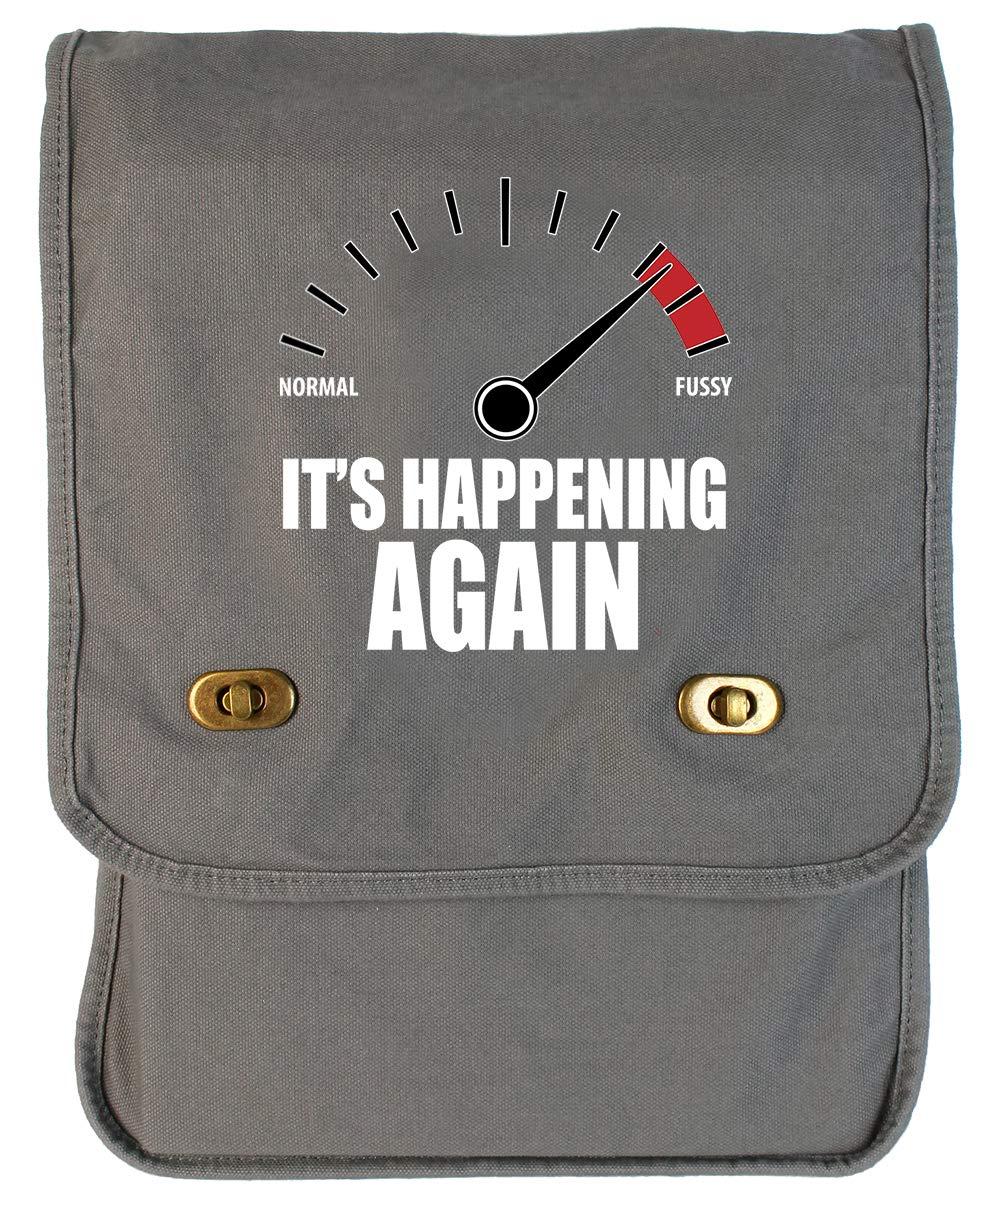 Tenacitee Fussy Its Happening Again Khaki Green Raw Edge Canvas Messenger Bag